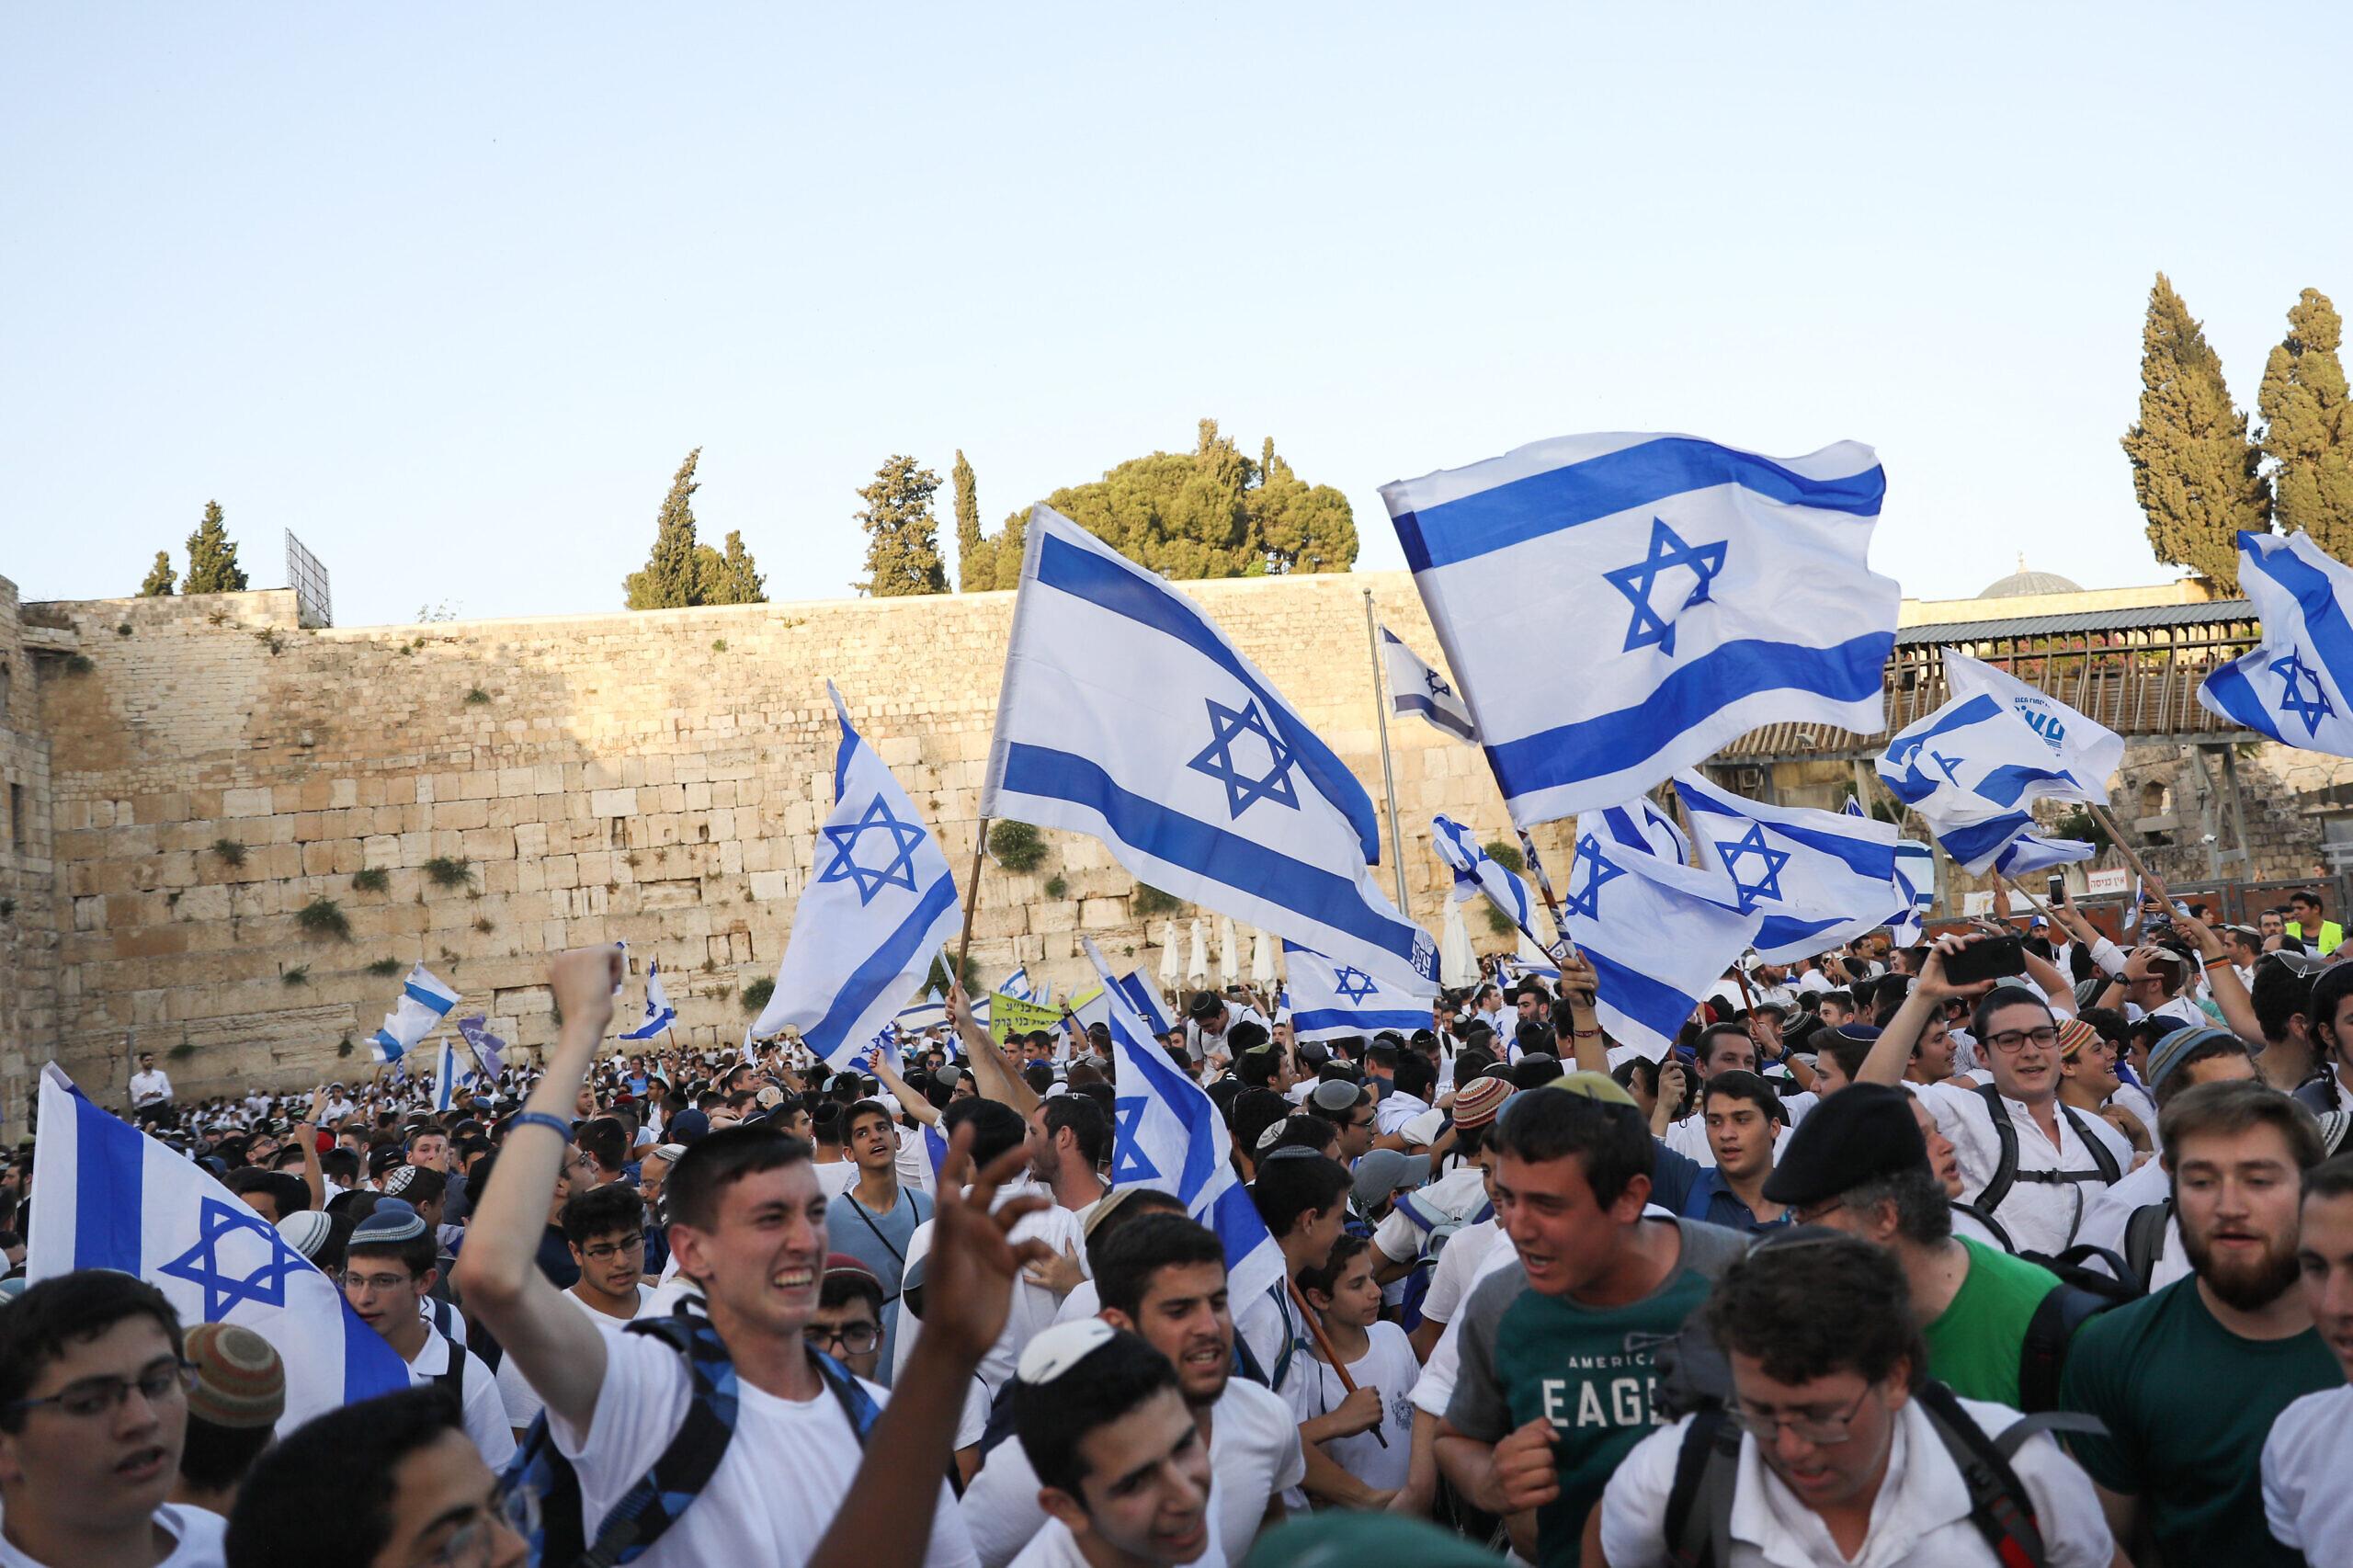 Jews celebrate Jerusalem day at the Western Wall in Jerusalem Old City during Yom Yerushalayim (Jerusalem Day), June 2, 2019. Photo by Noam Revkin Fenton/Flash90.